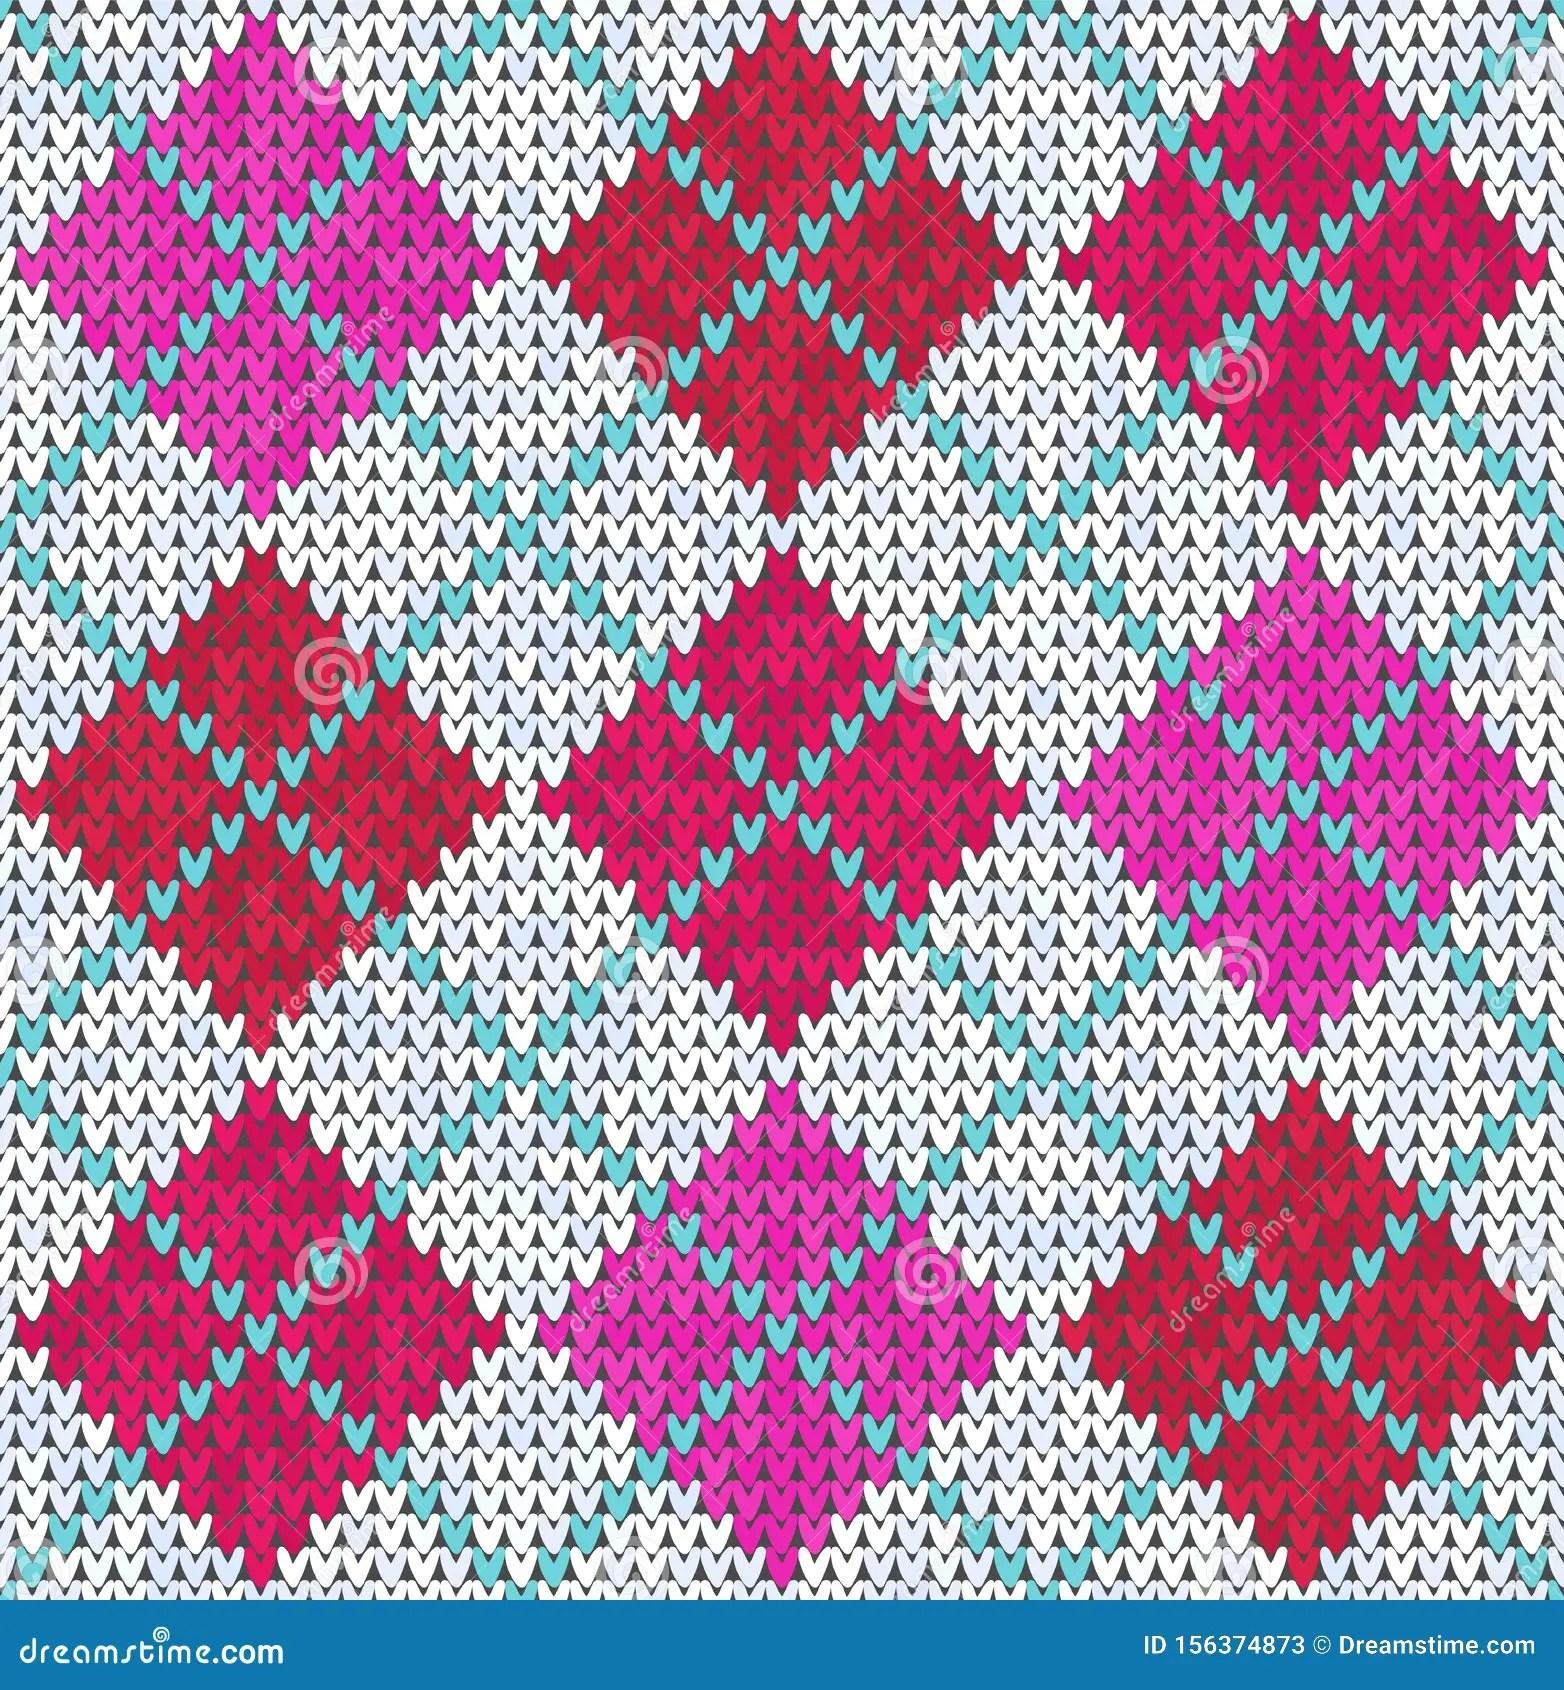 Knitting Classic Geometric Pattern Knitted Realistic